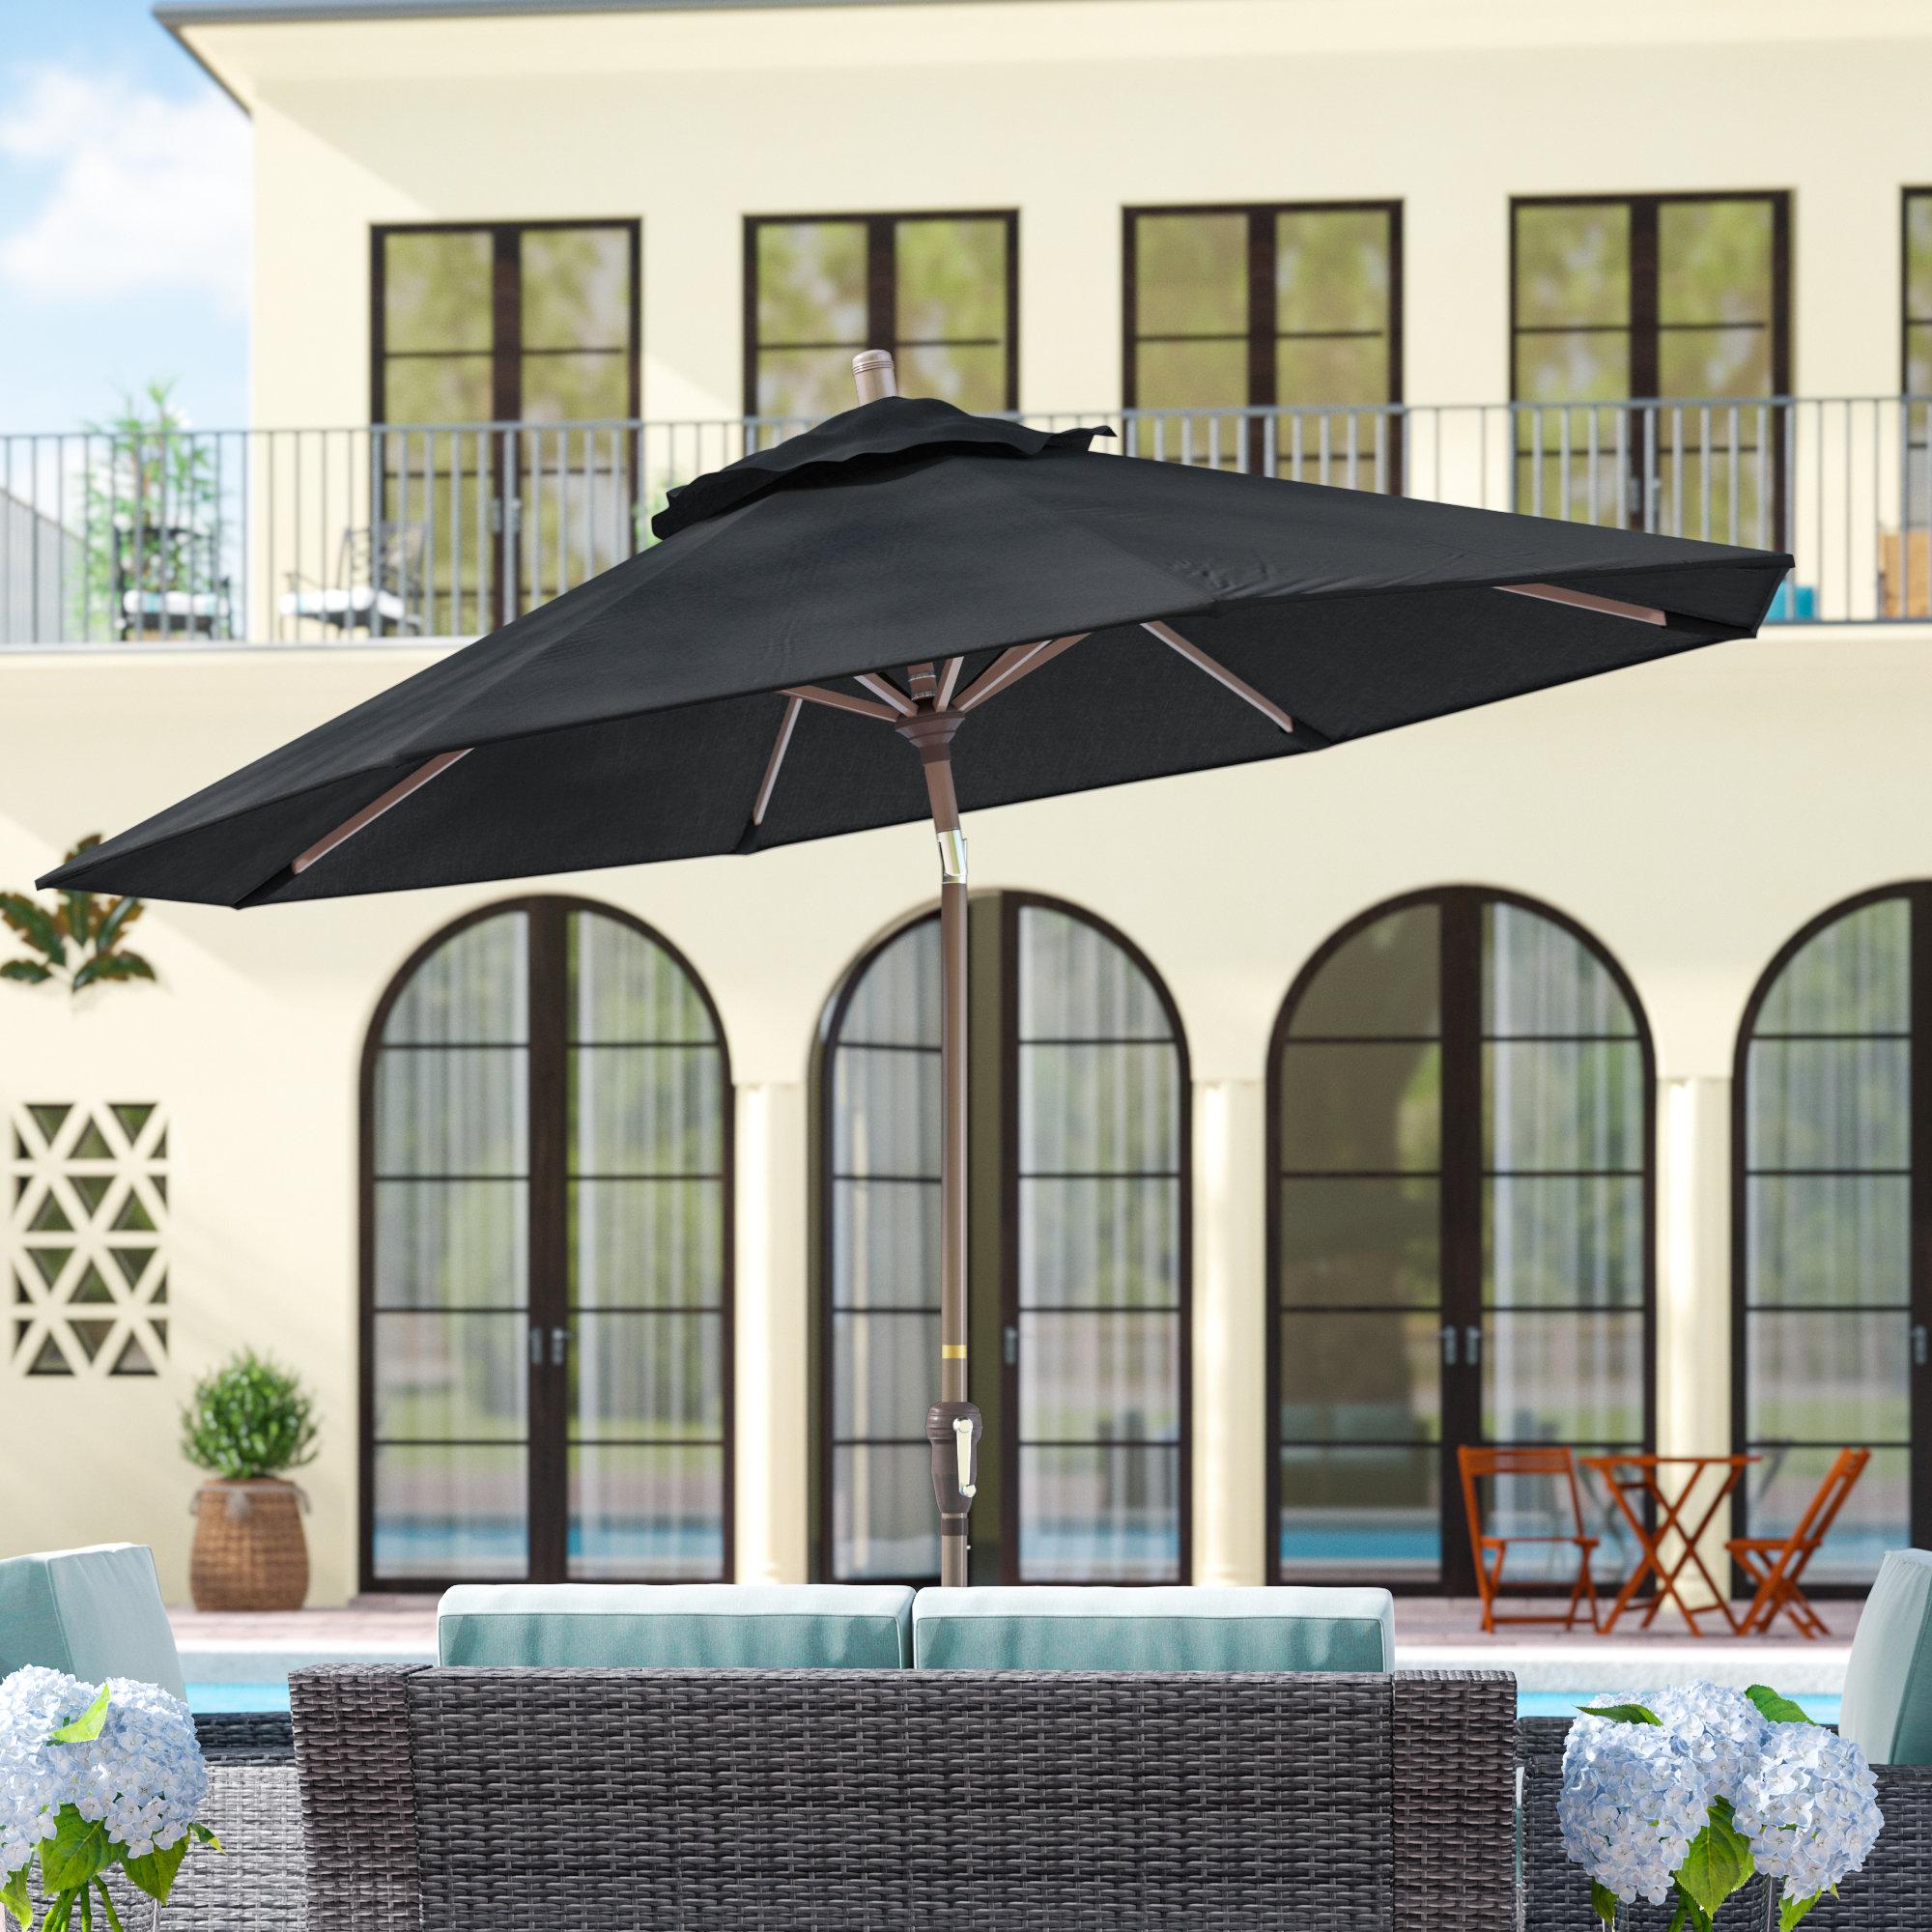 Most Recent Mullaney Beachcrest Home Market Umbrellas Pertaining To Mullaney 9' Market Umbrella (Gallery 4 of 20)